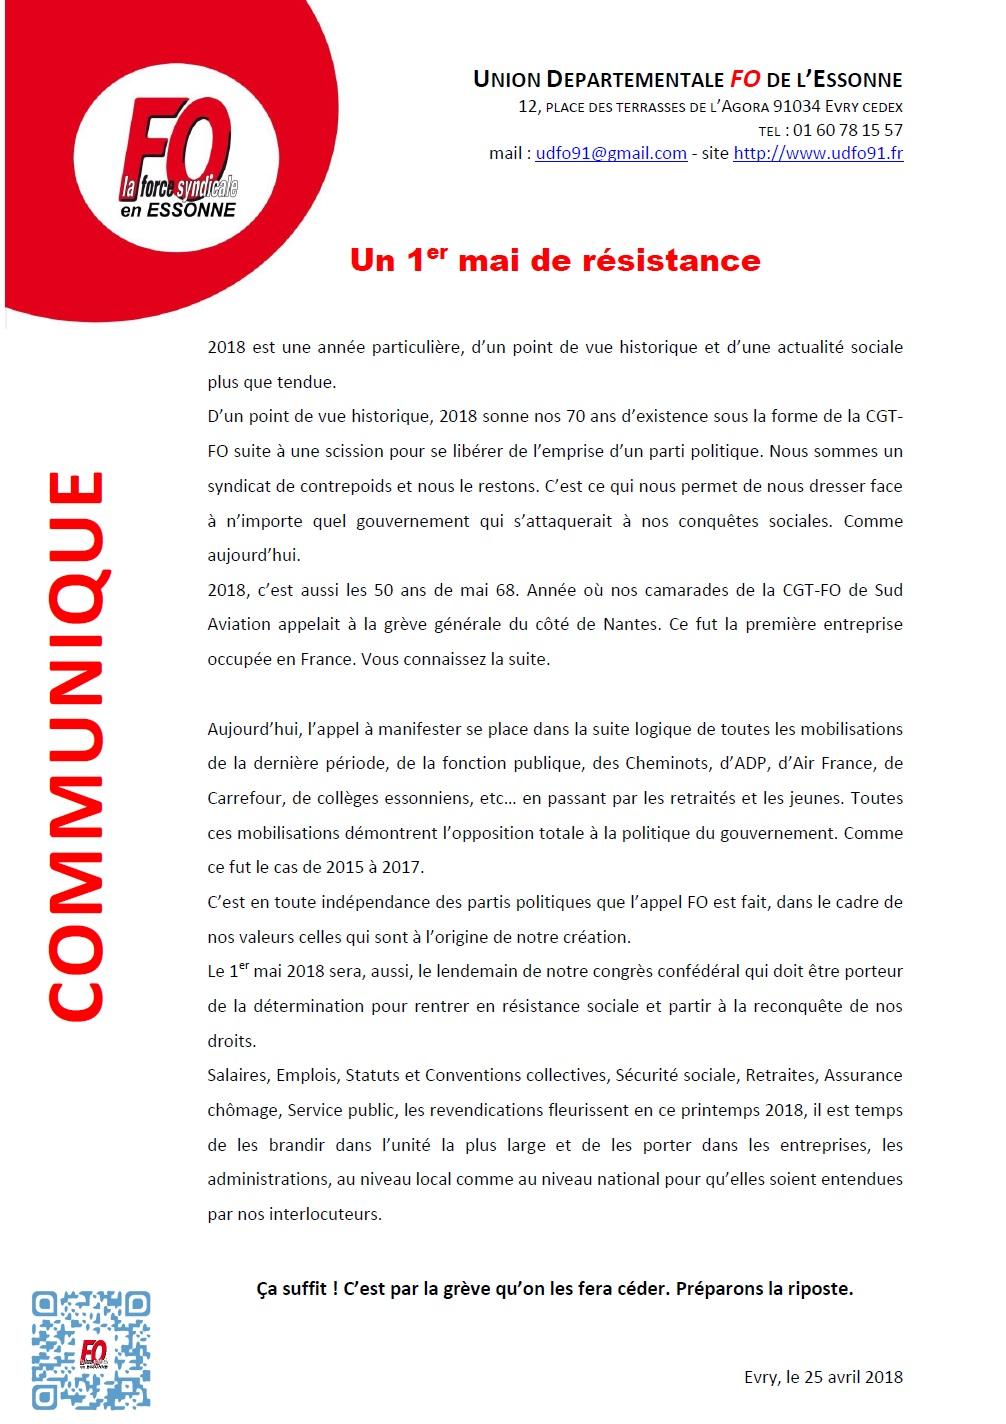 Image of Un 1er mai de résistance